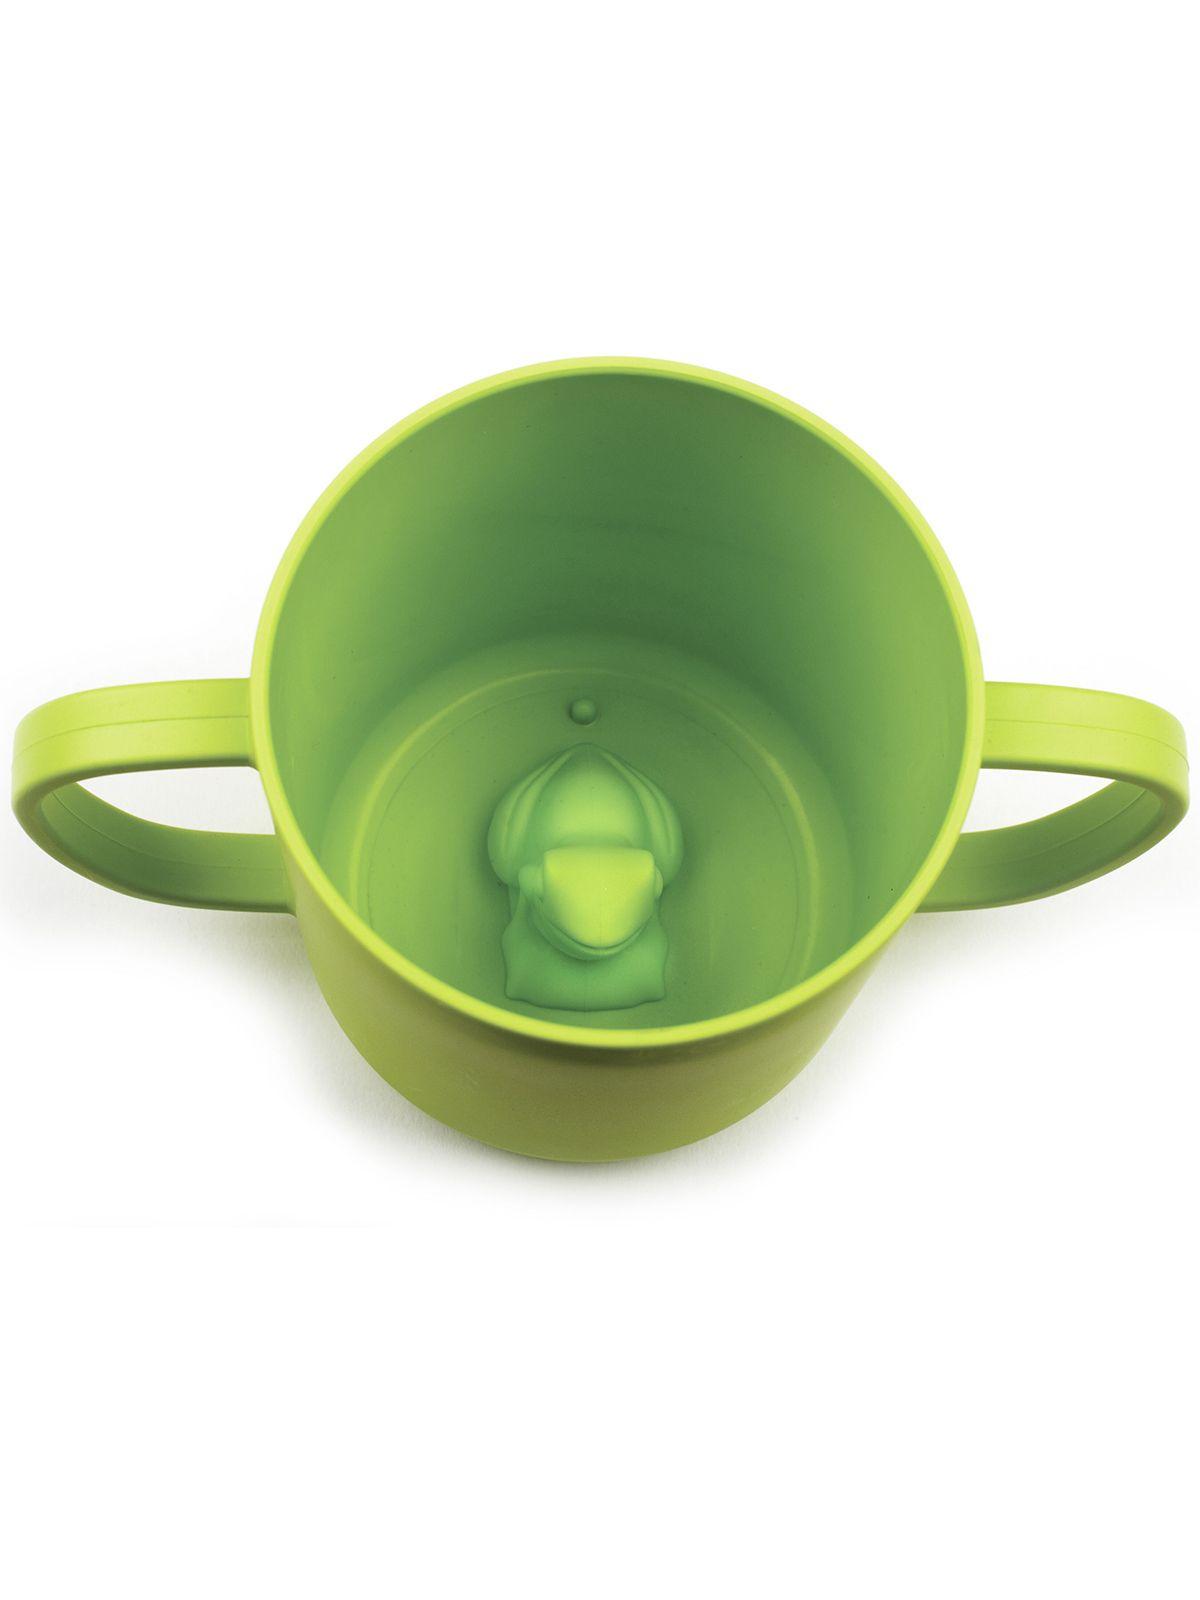 Пинкл (Pinkl) | Детская кружка CUPPIES с лягушонком | Jjrabbit Cuppies Frog